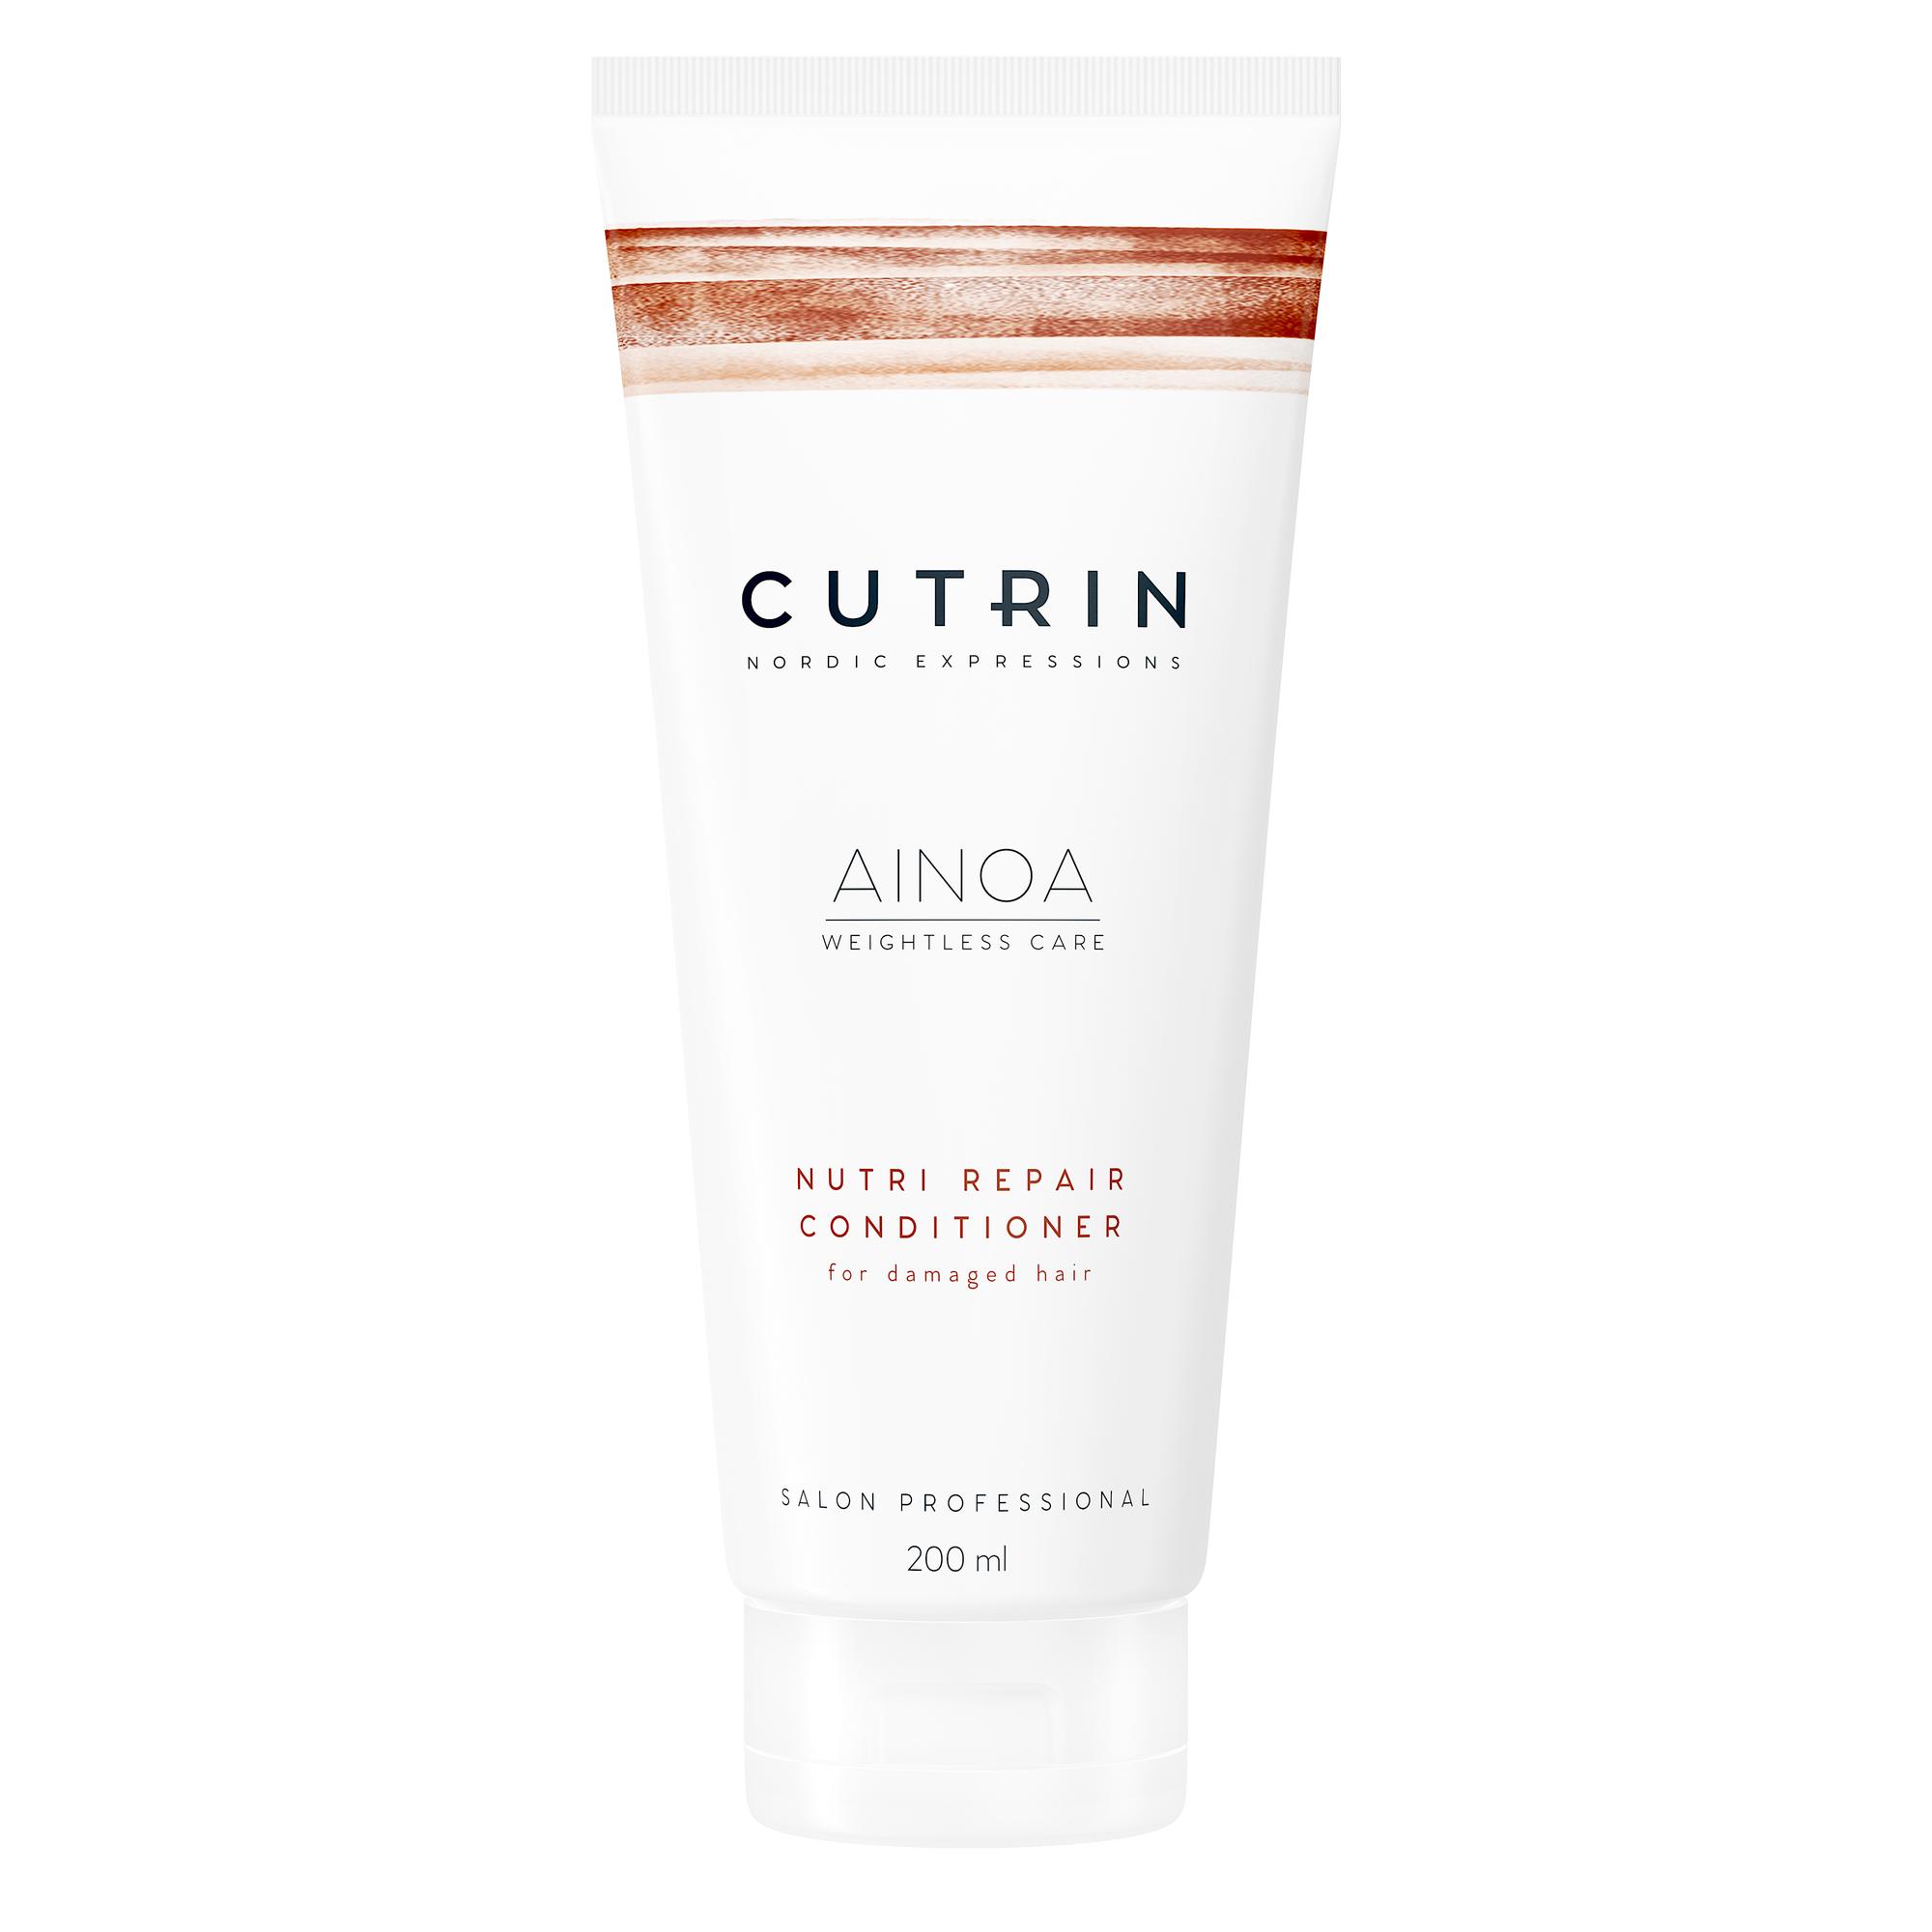 CUTRIN Кондиционер для восстановления волос / AINOA NUTRI REPAIR 200 мл.